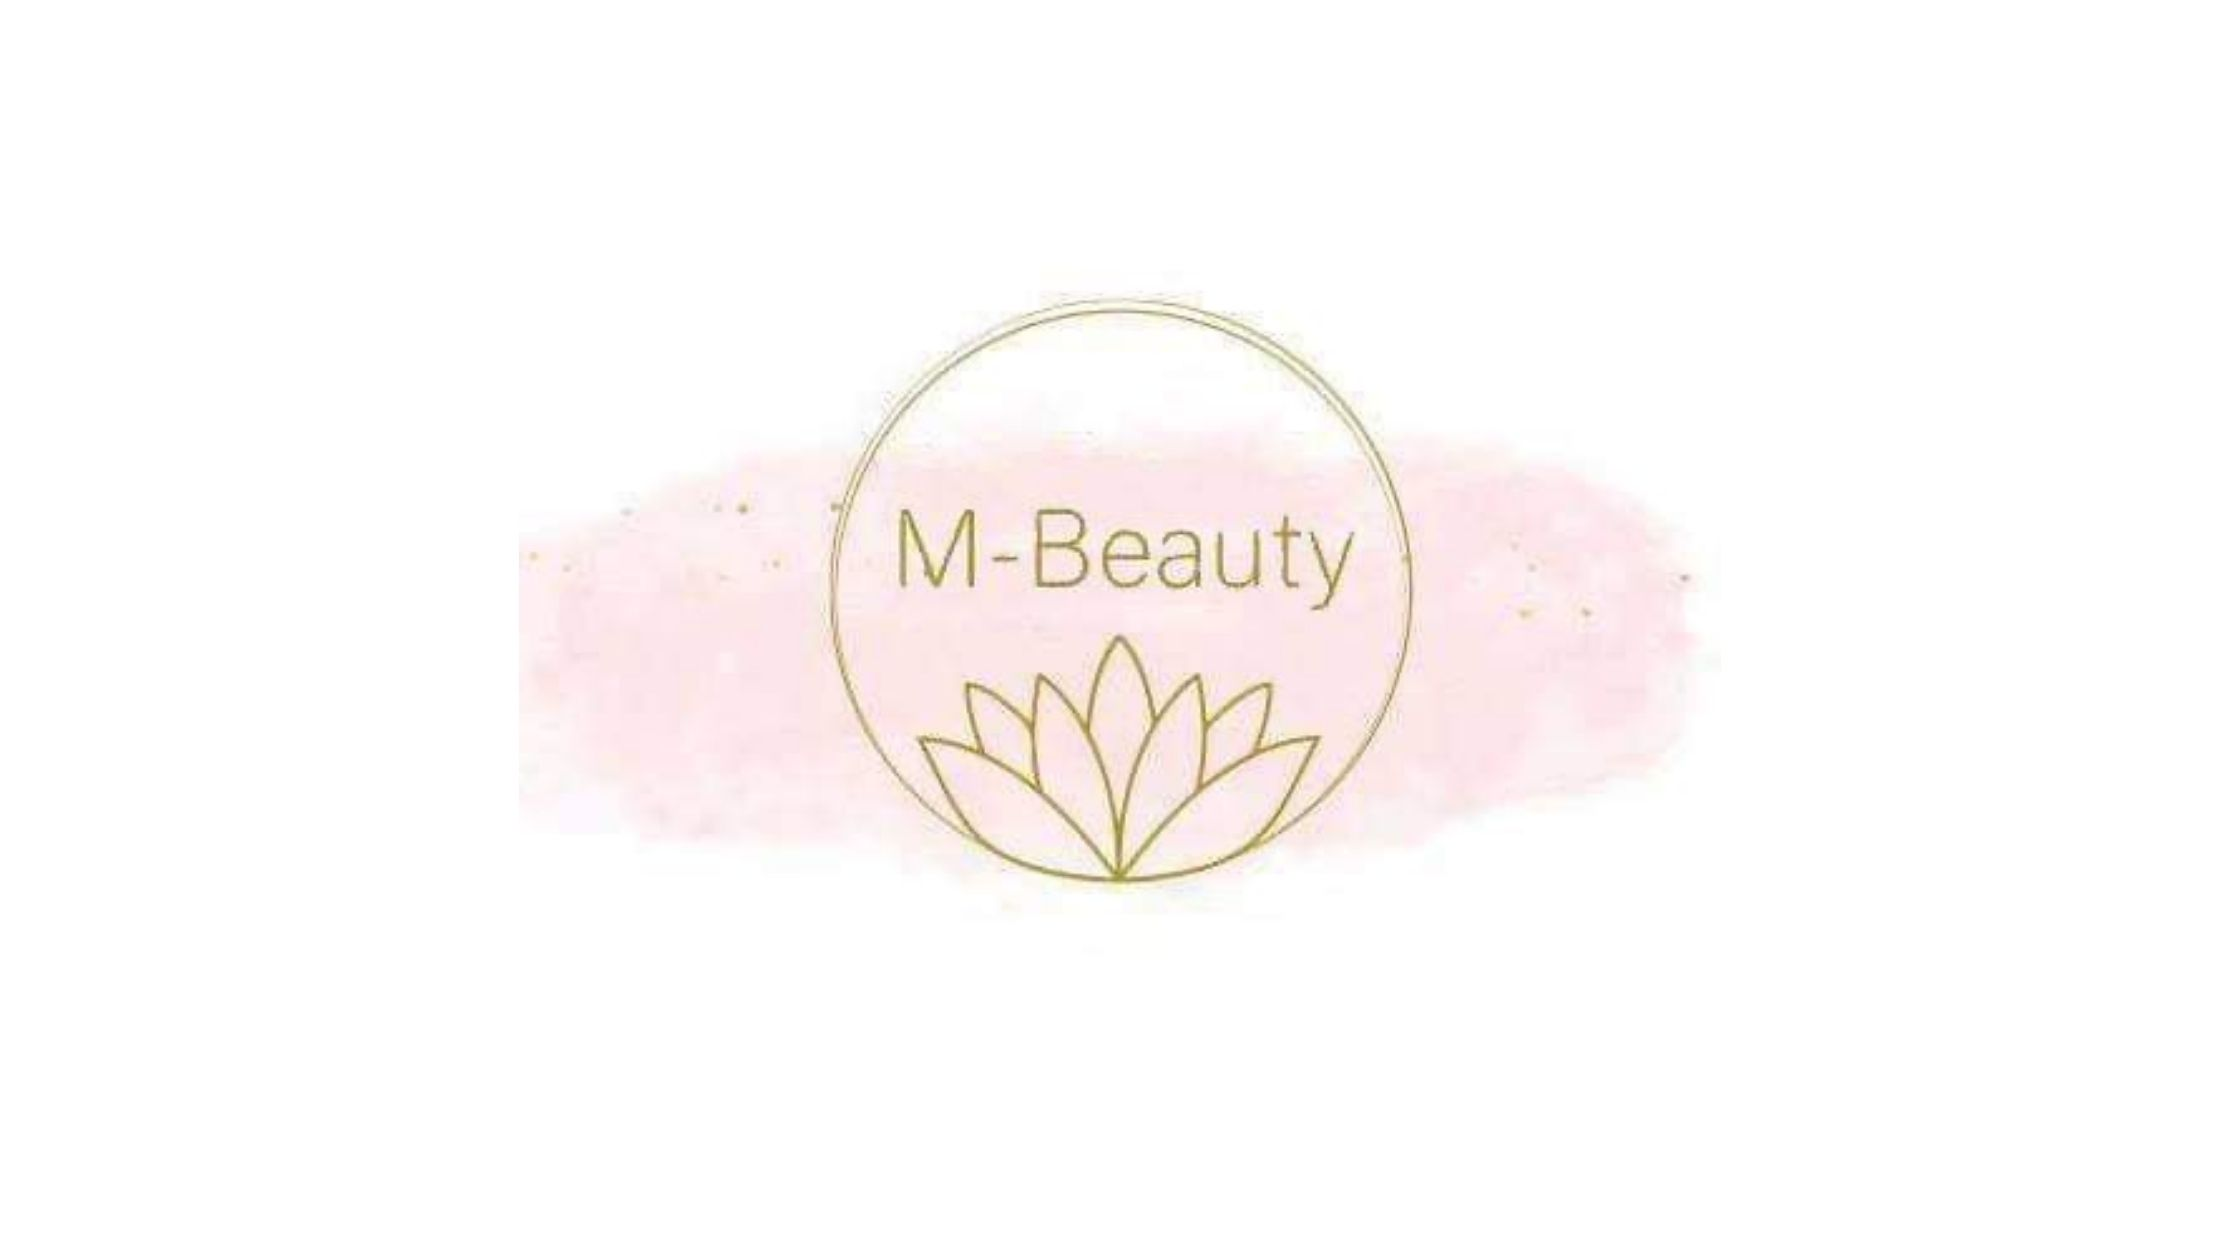 m-beauty